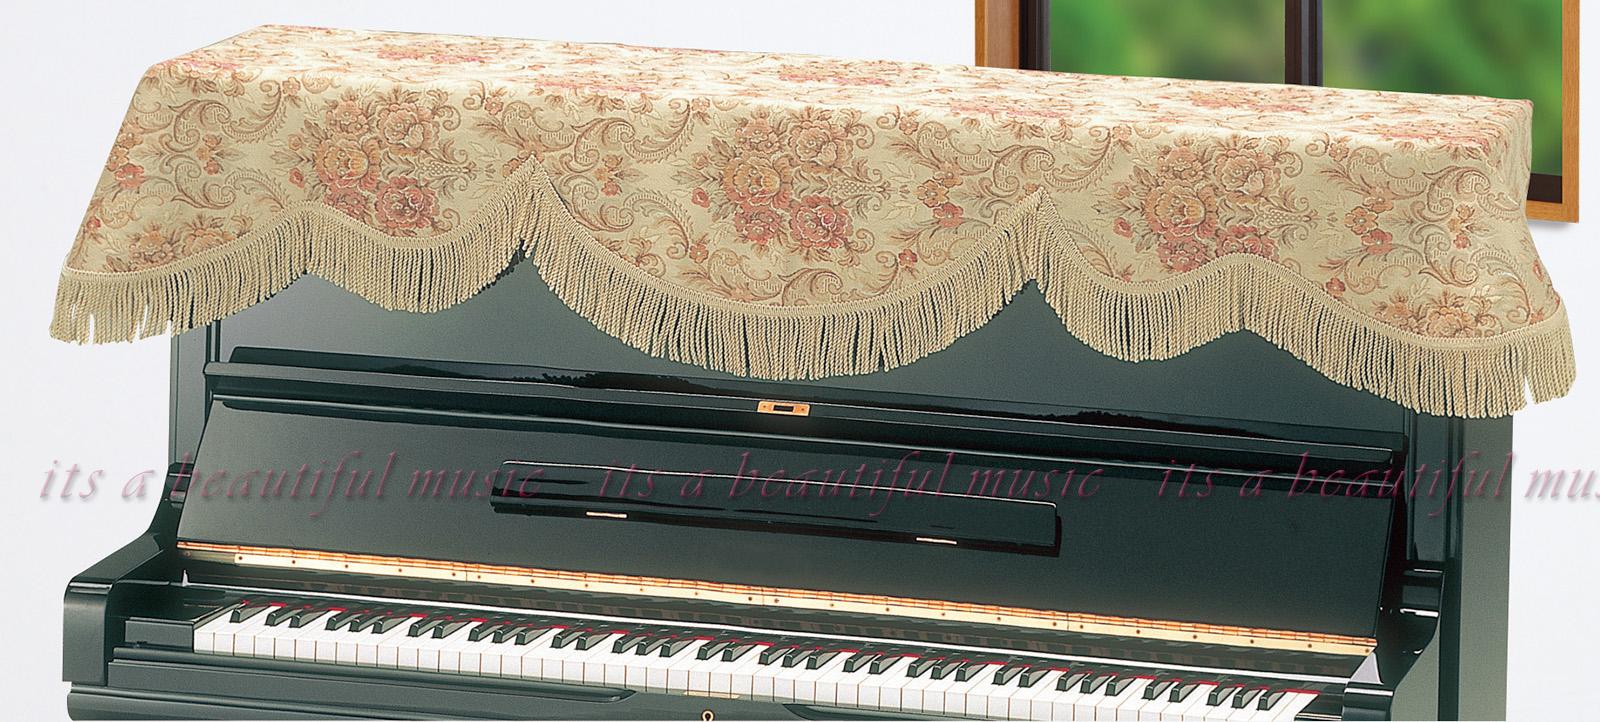 【its】アップライトピアノカバー(トップカバー) 甲南 ロザリオ【フリーサイズ】(甲南ロザリオシリーズ)